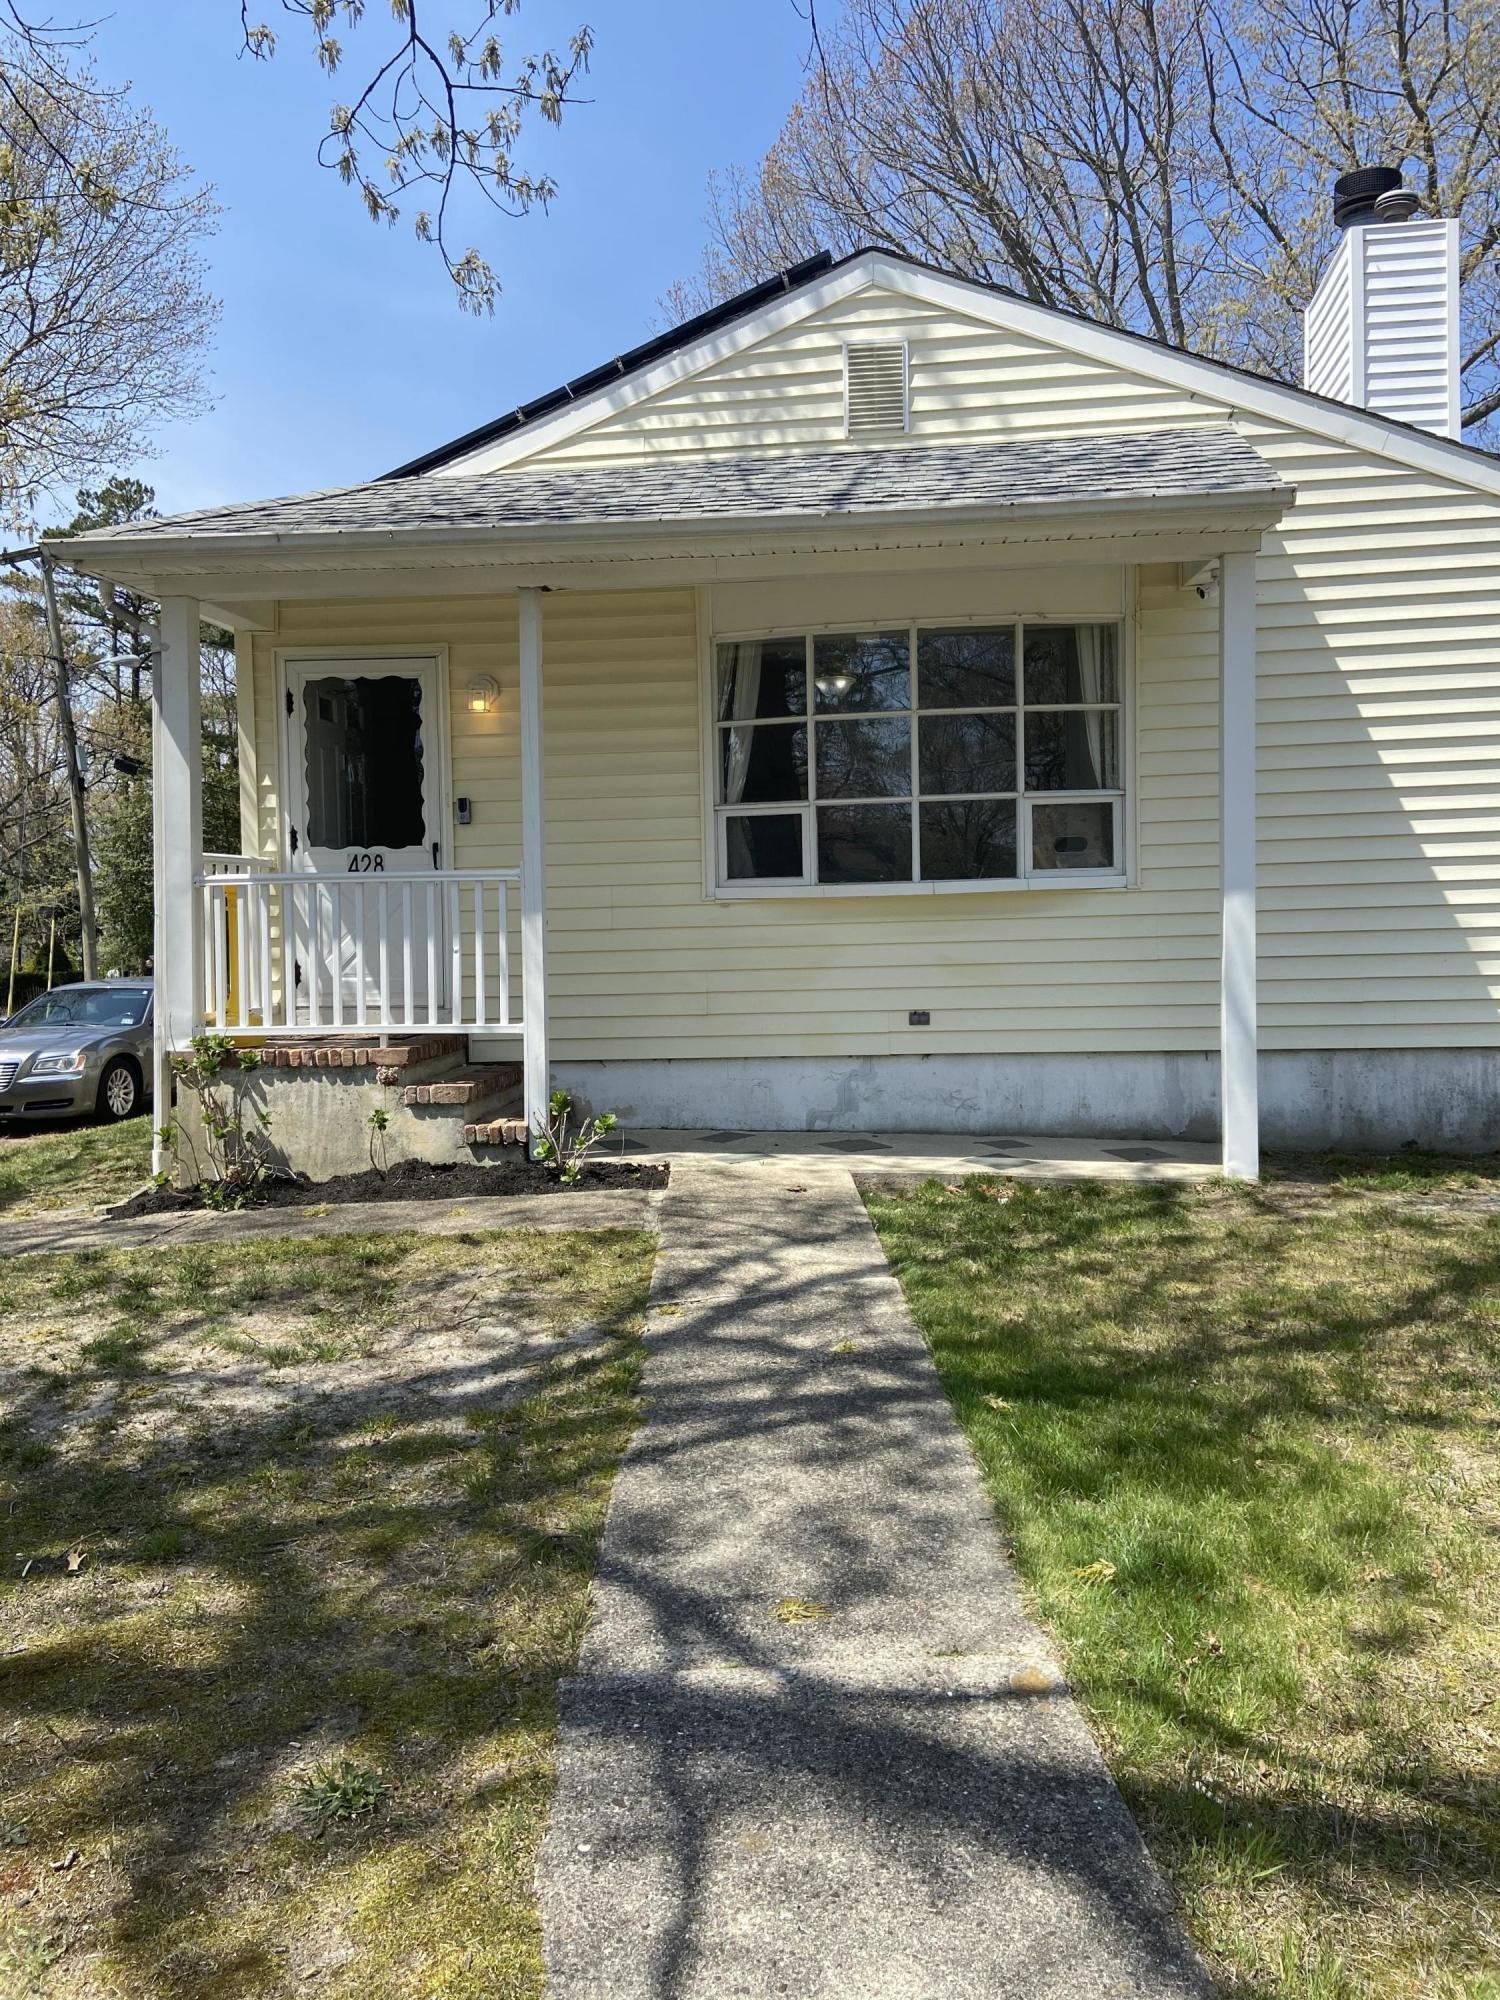 428 Morris Boulevard, Toms River, New Jersey 08753, 3 Bedrooms Bedrooms, ,1 BathroomBathrooms,Single Family,For Sale,428 Morris Boulevard,1,22111902